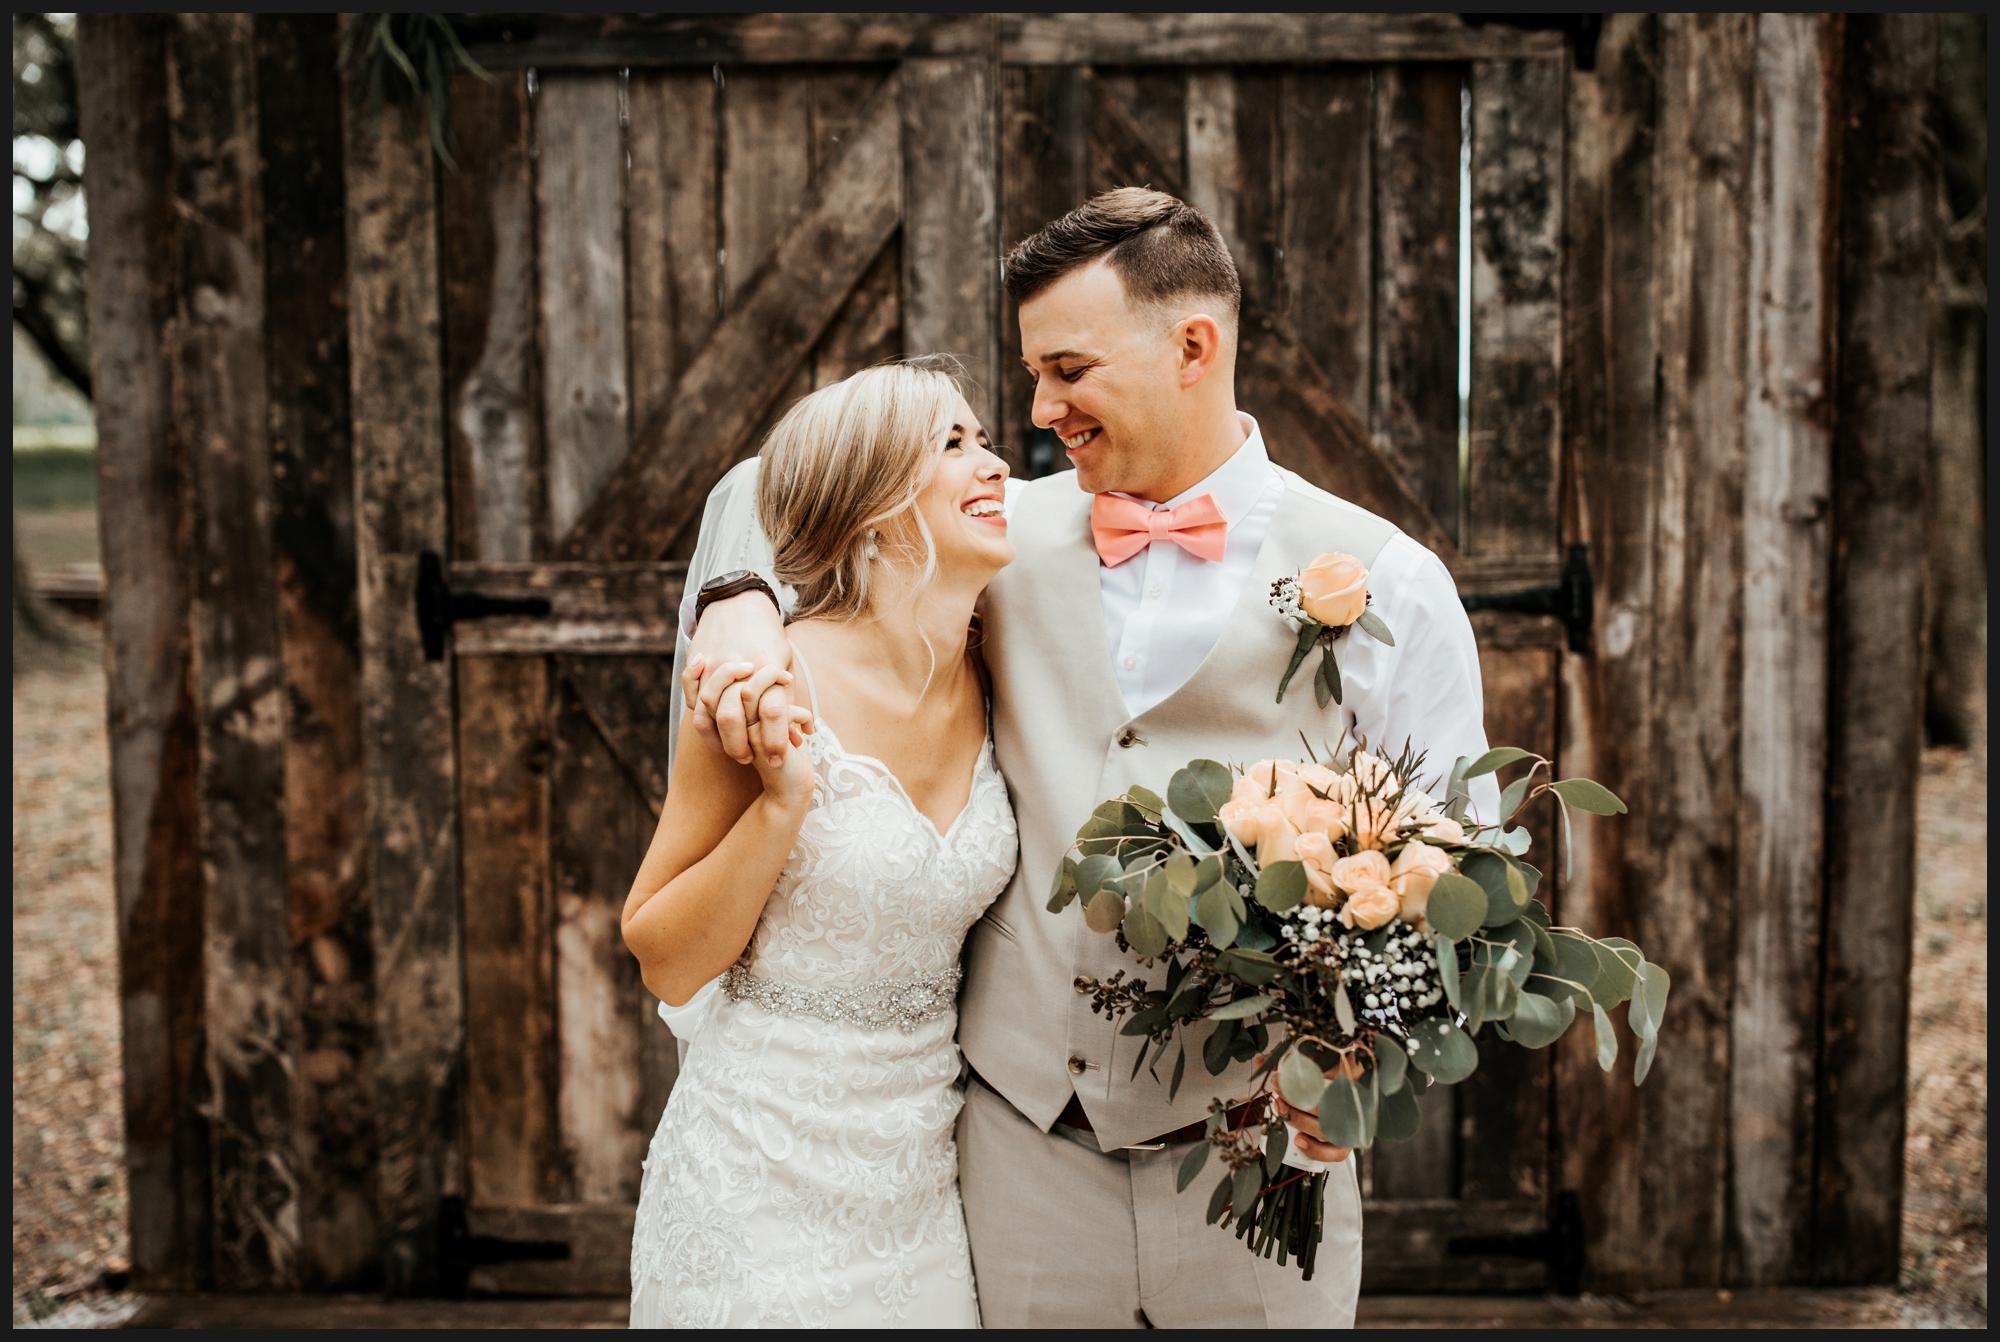 Orlando-Wedding-Photographer-destination-wedding-photographer-florida-wedding-photographer-hawaii-wedding-photographer_0296.jpg